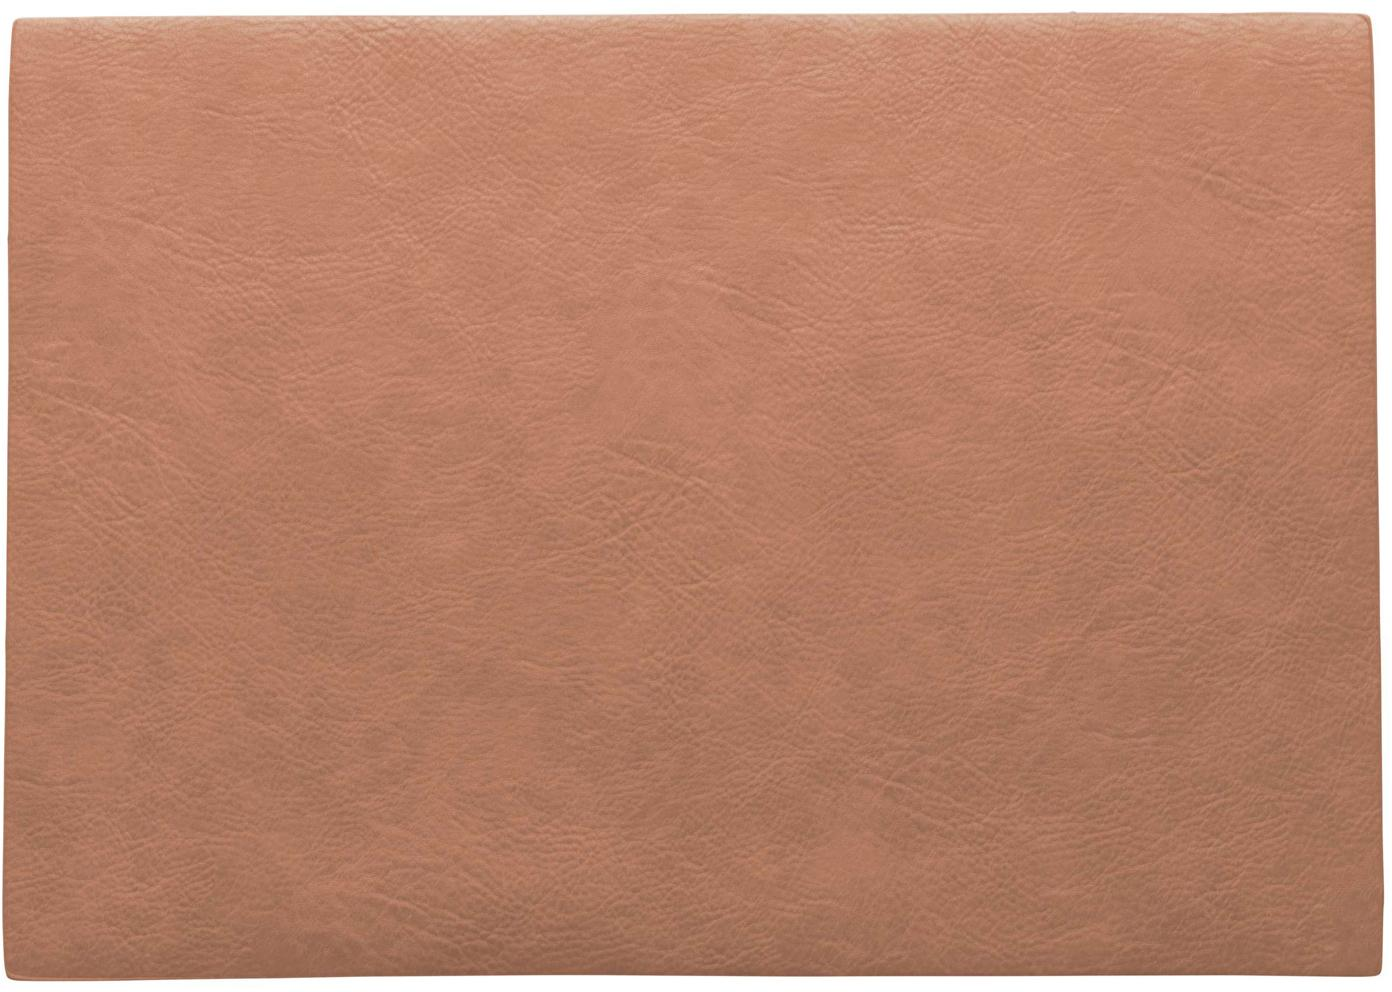 Kunstleder -Tischsets Plini, 2 Stück, Veganes Leder (Polyurethan), Korallrosa, 33 x 46 cm